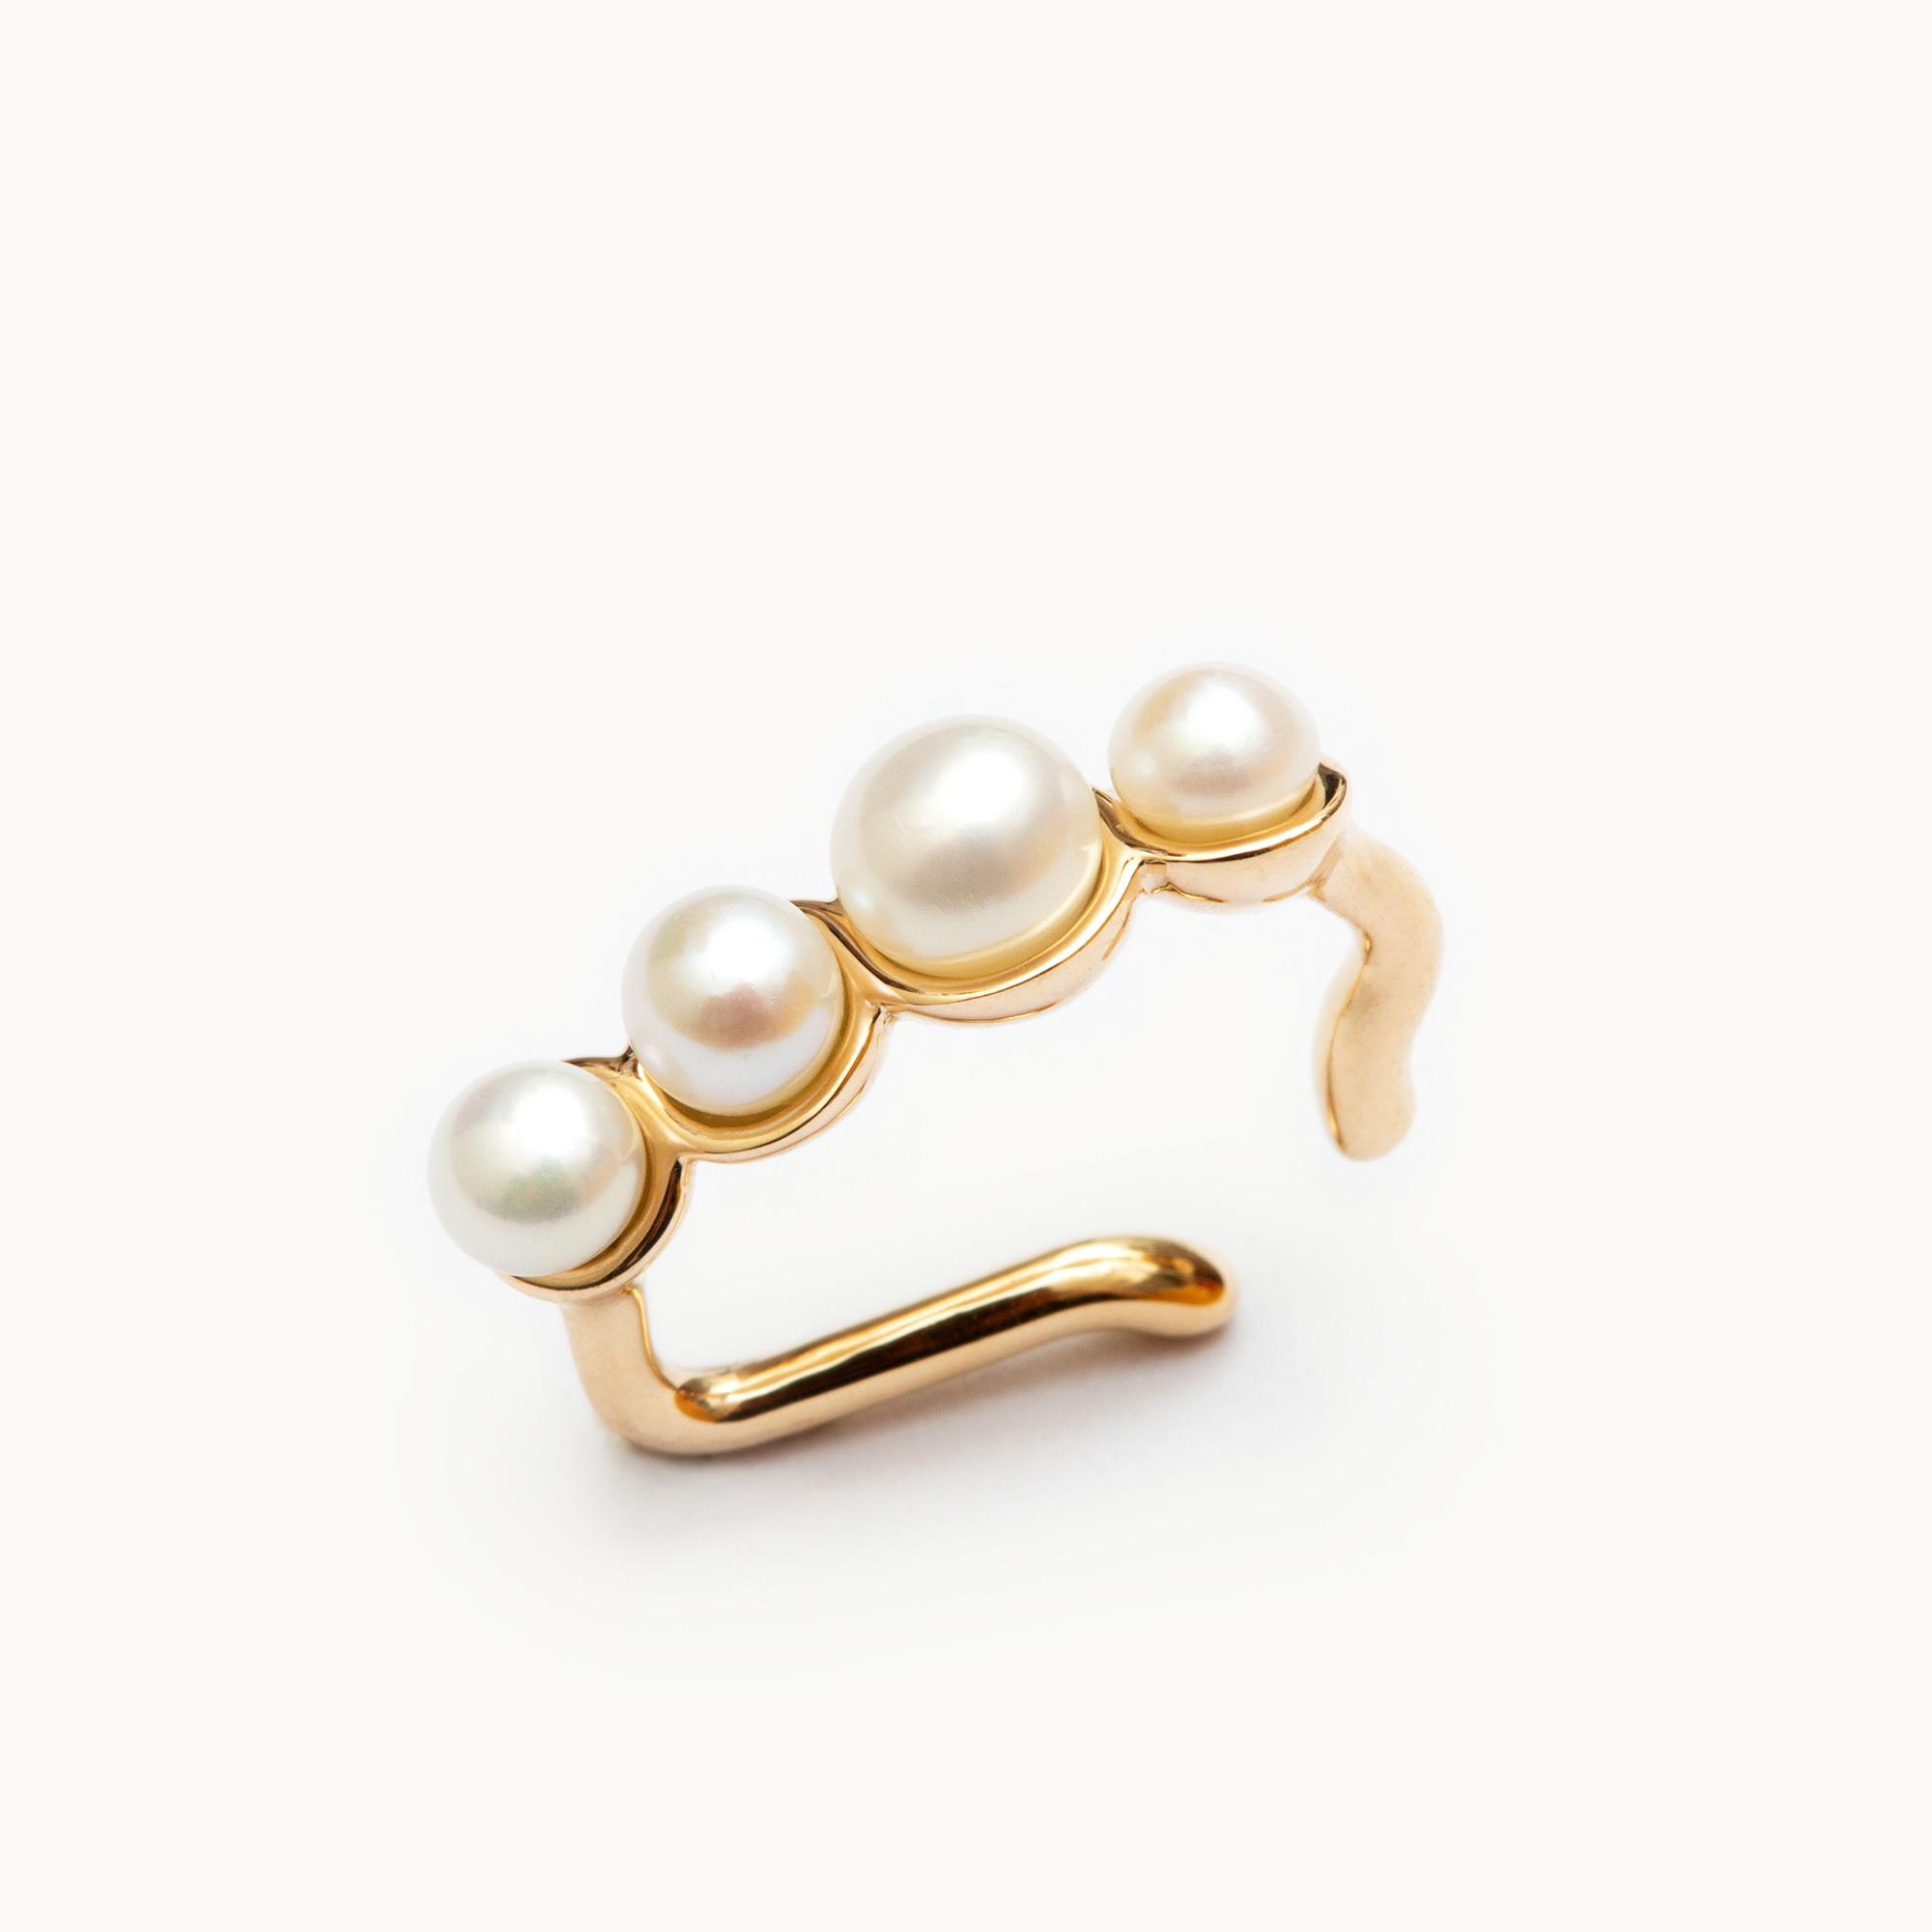 Pearl Ear Cuff|イヤーカフ  - art.1803C173030